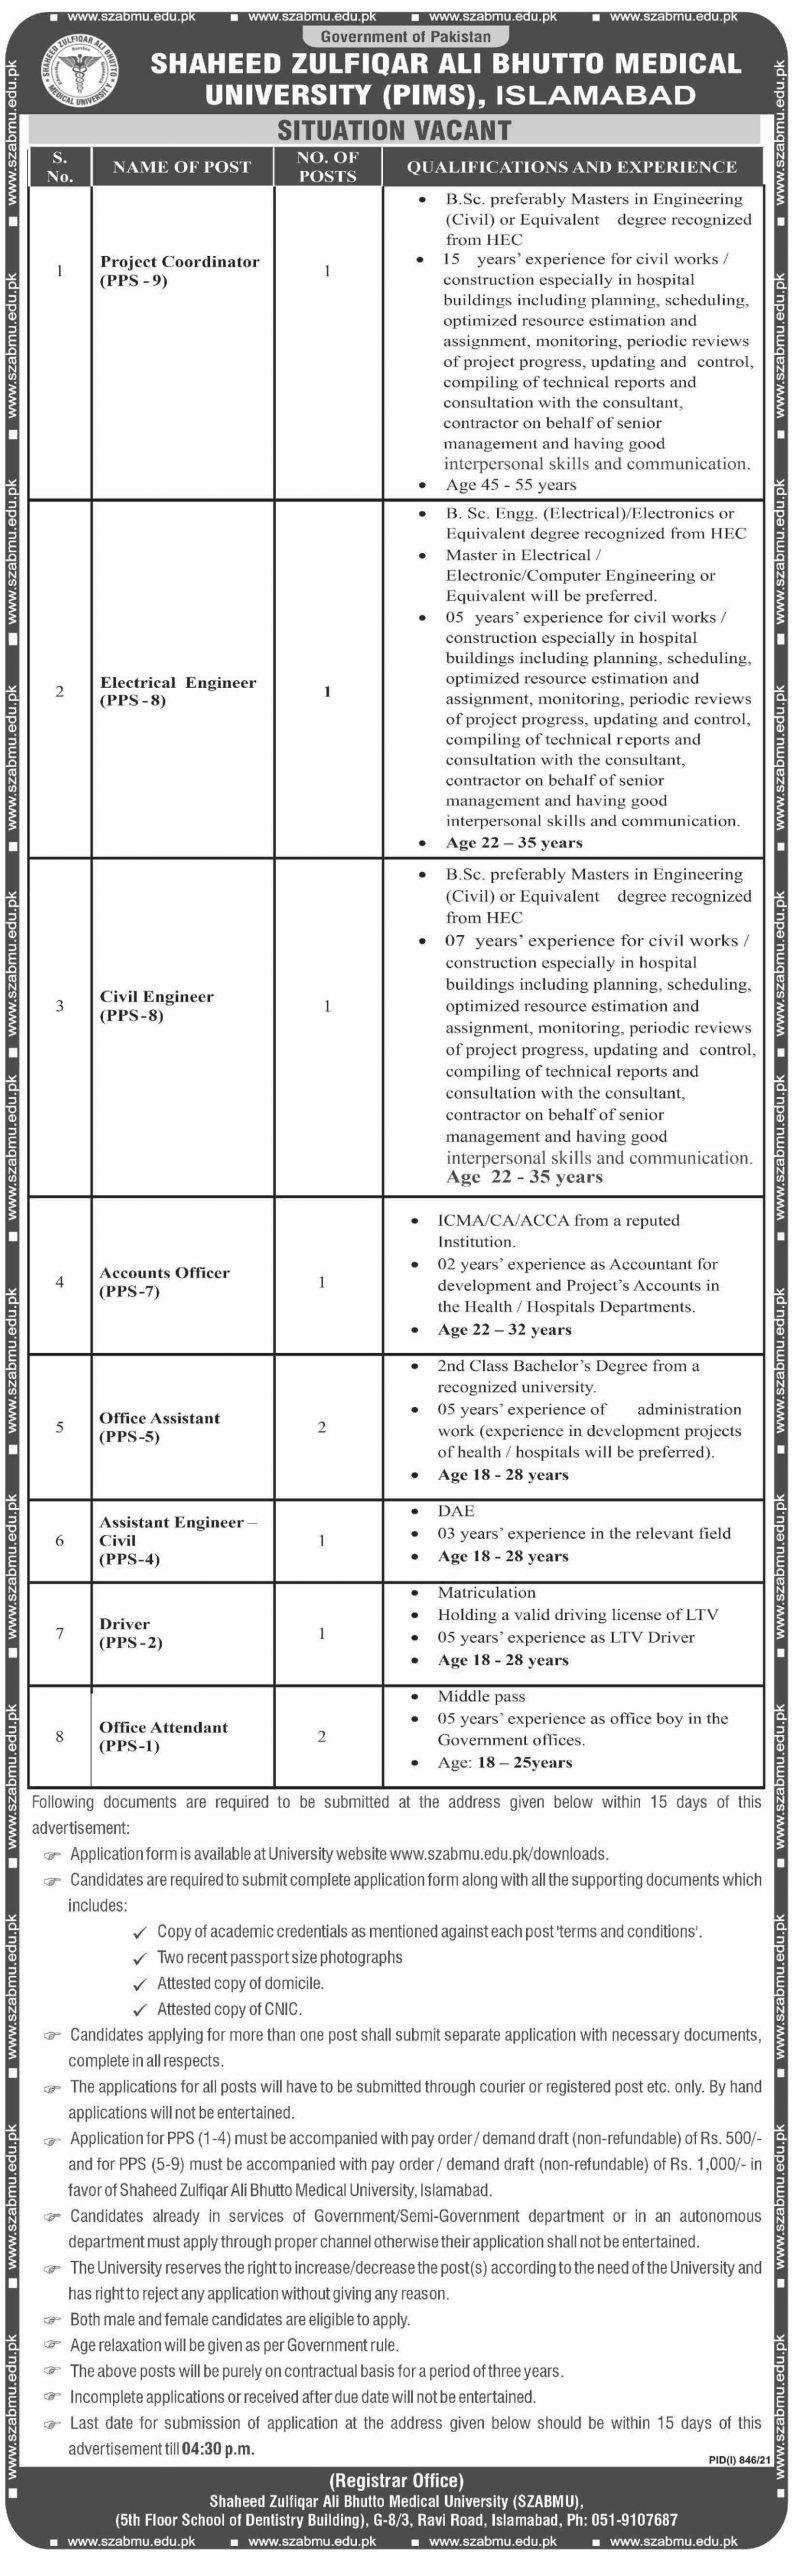 PIMS Jobs 2021 – University Jobs – Download Application Form